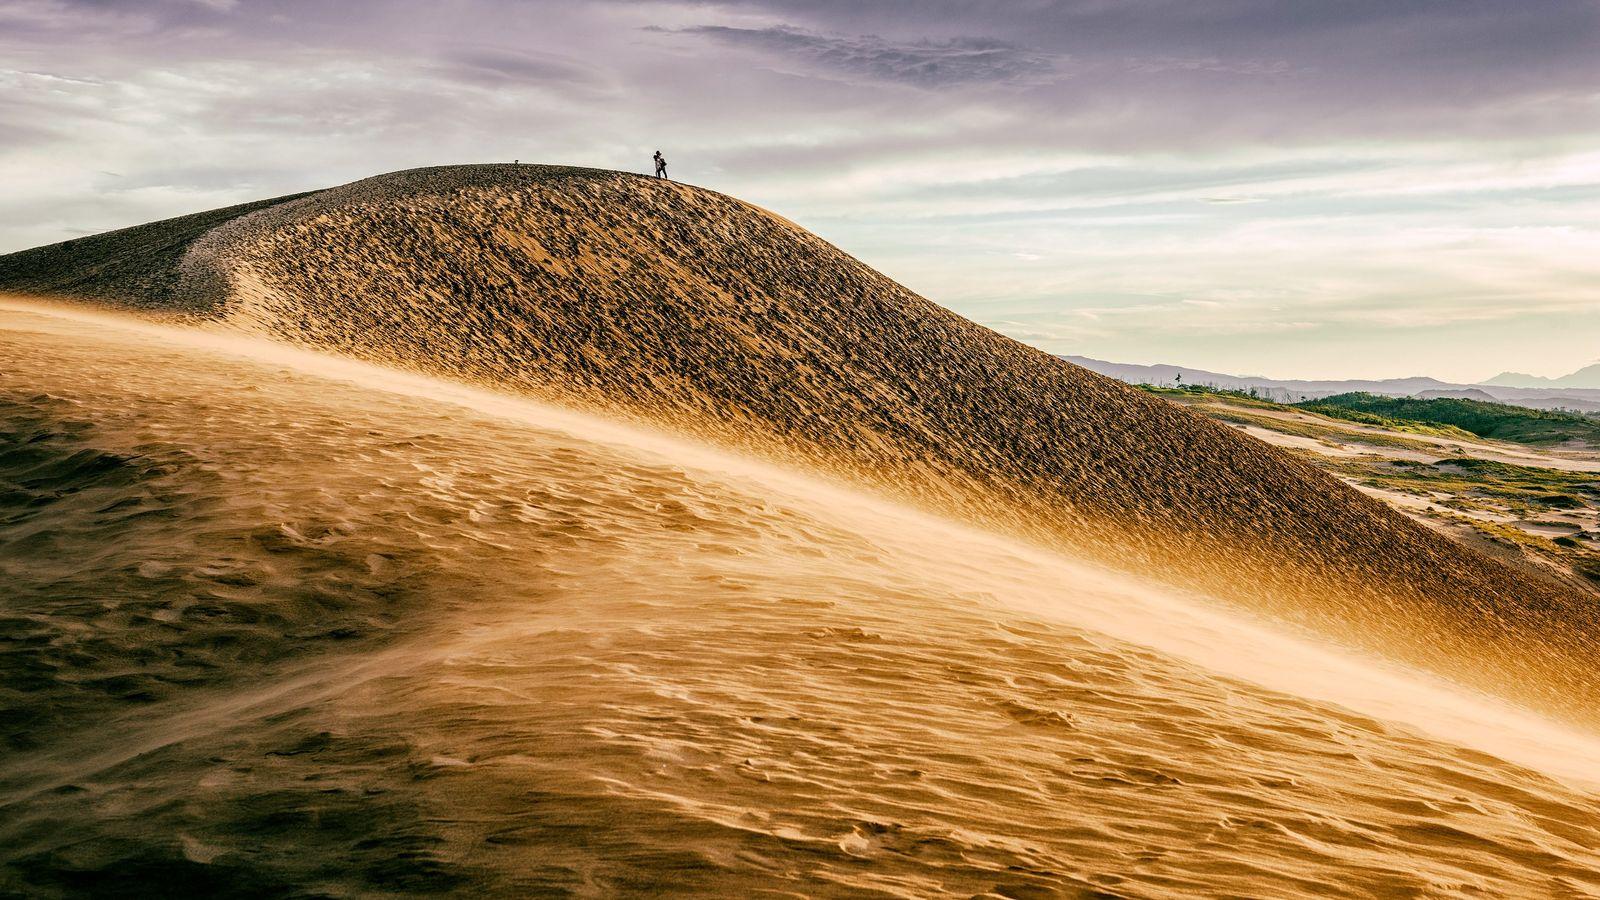 Die Sanddünen in Tottori, Japan.